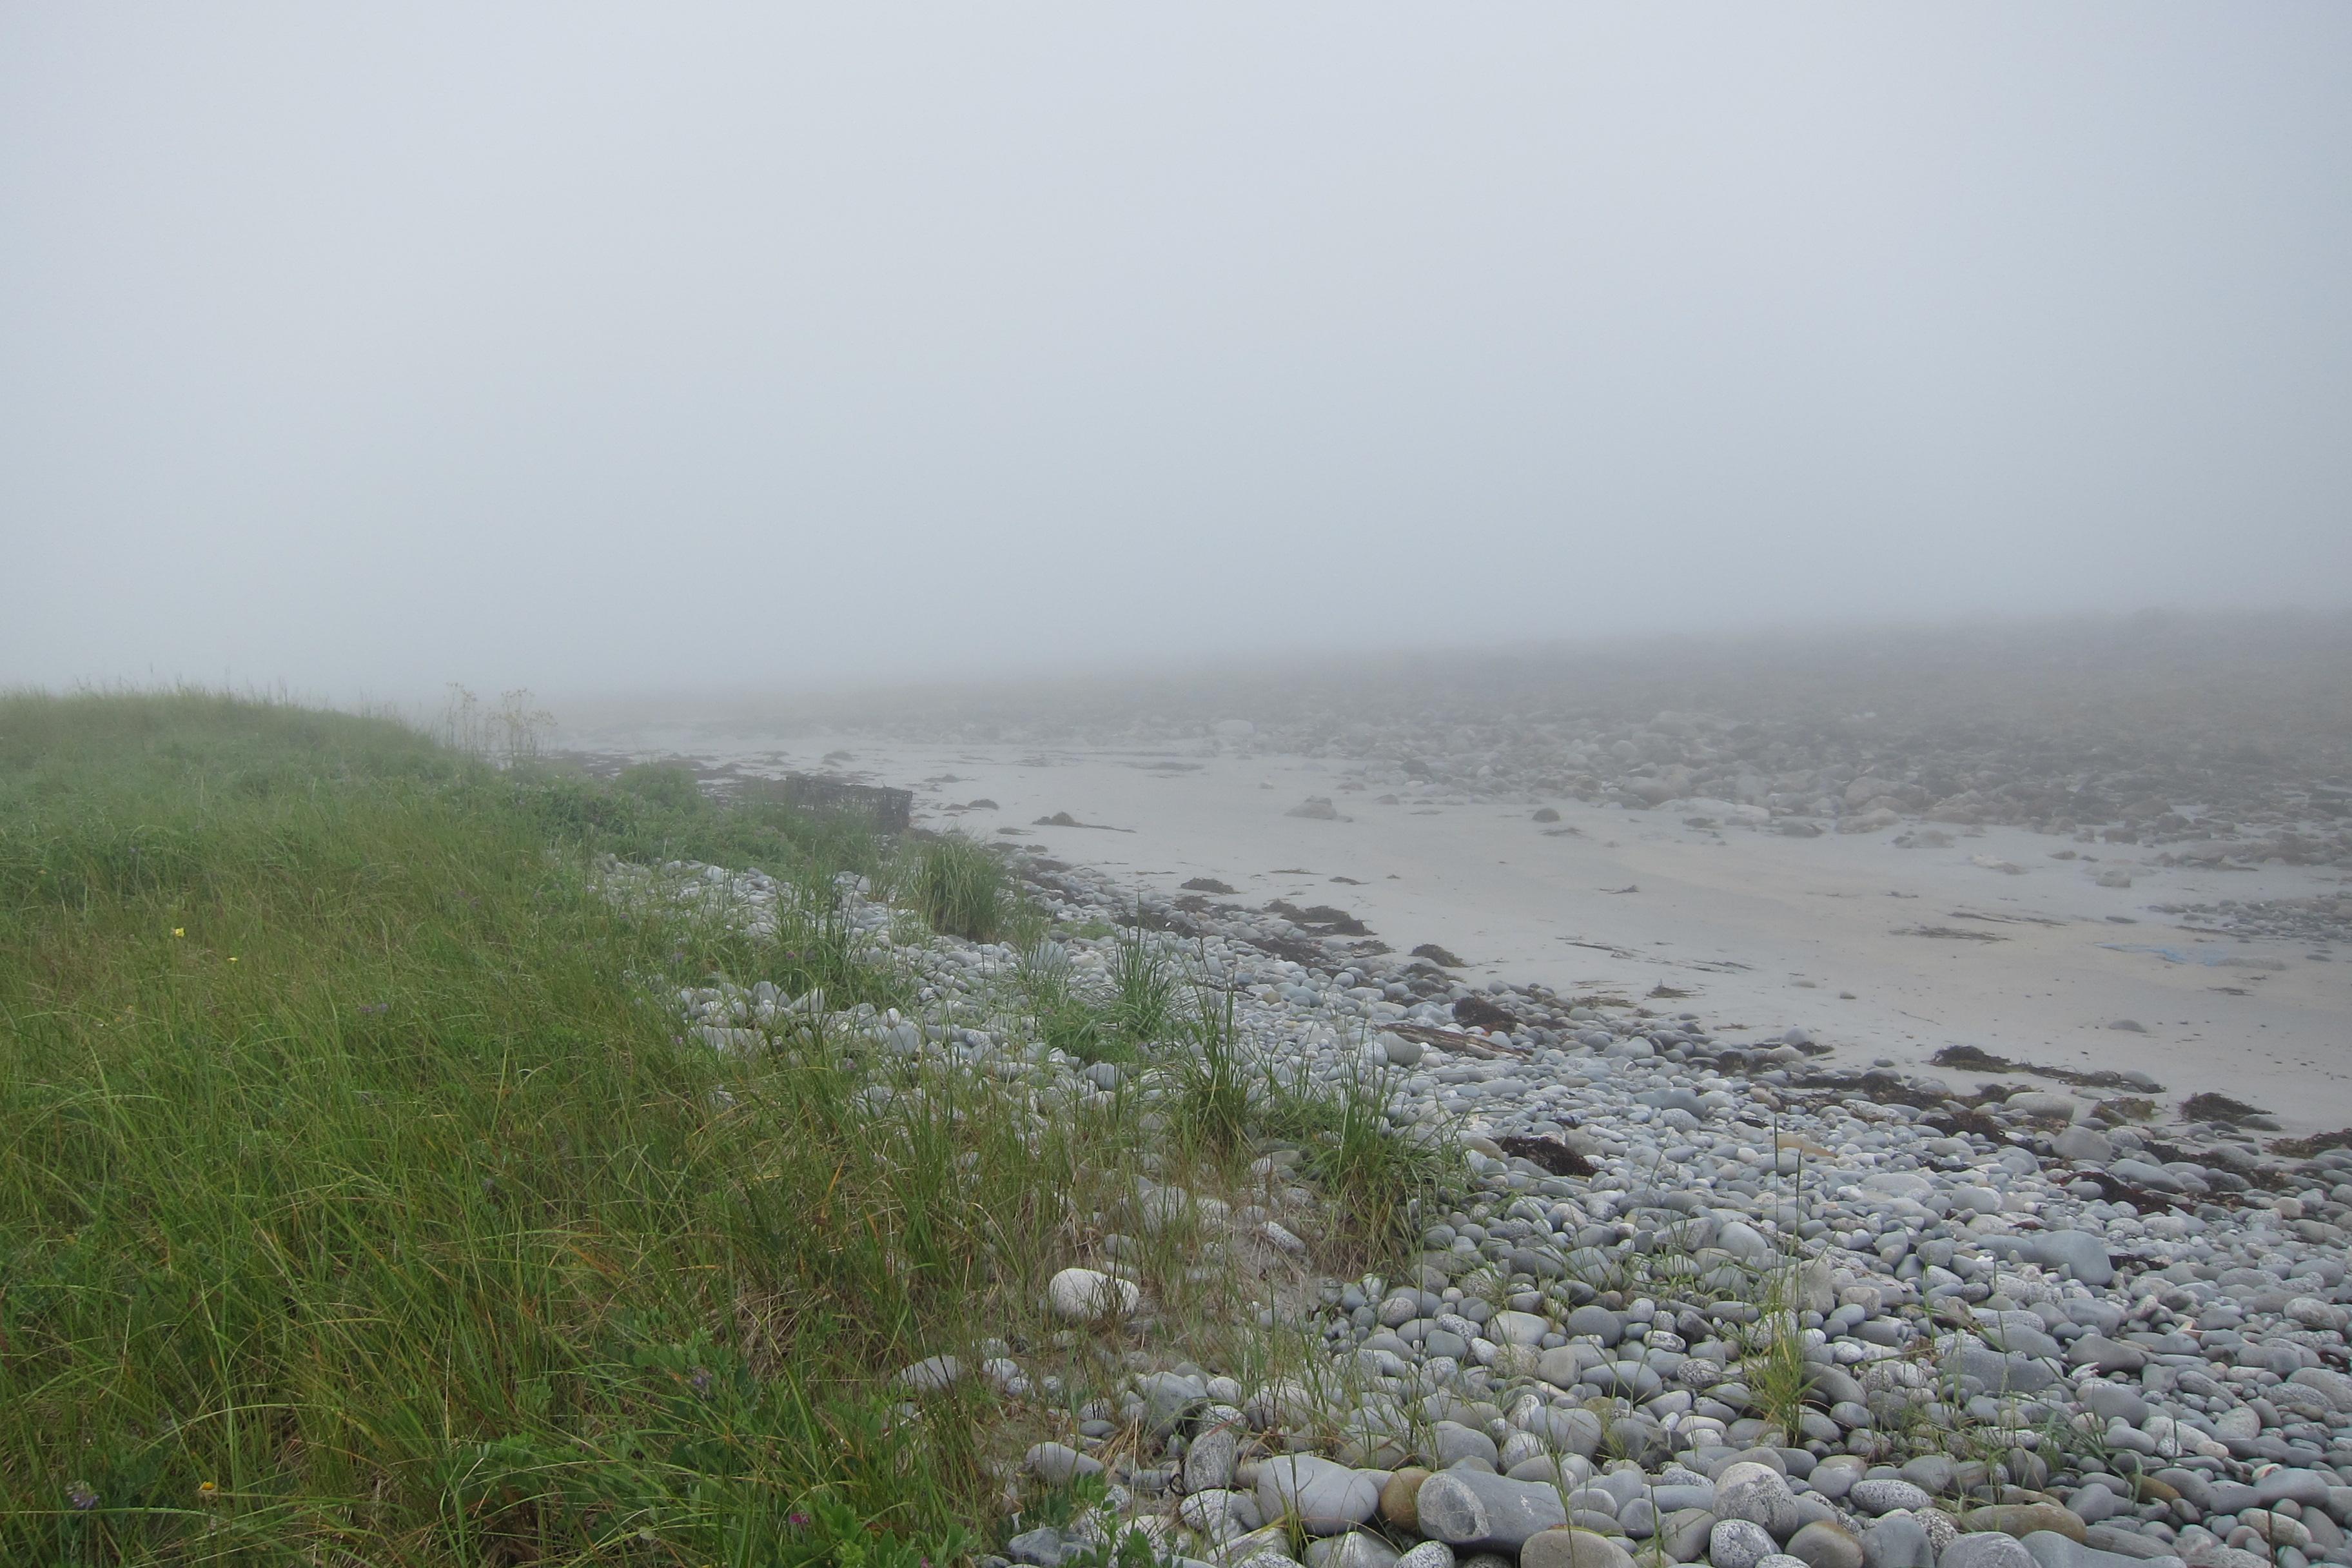 Archaeology at Fort Saint-Louis - Part 8